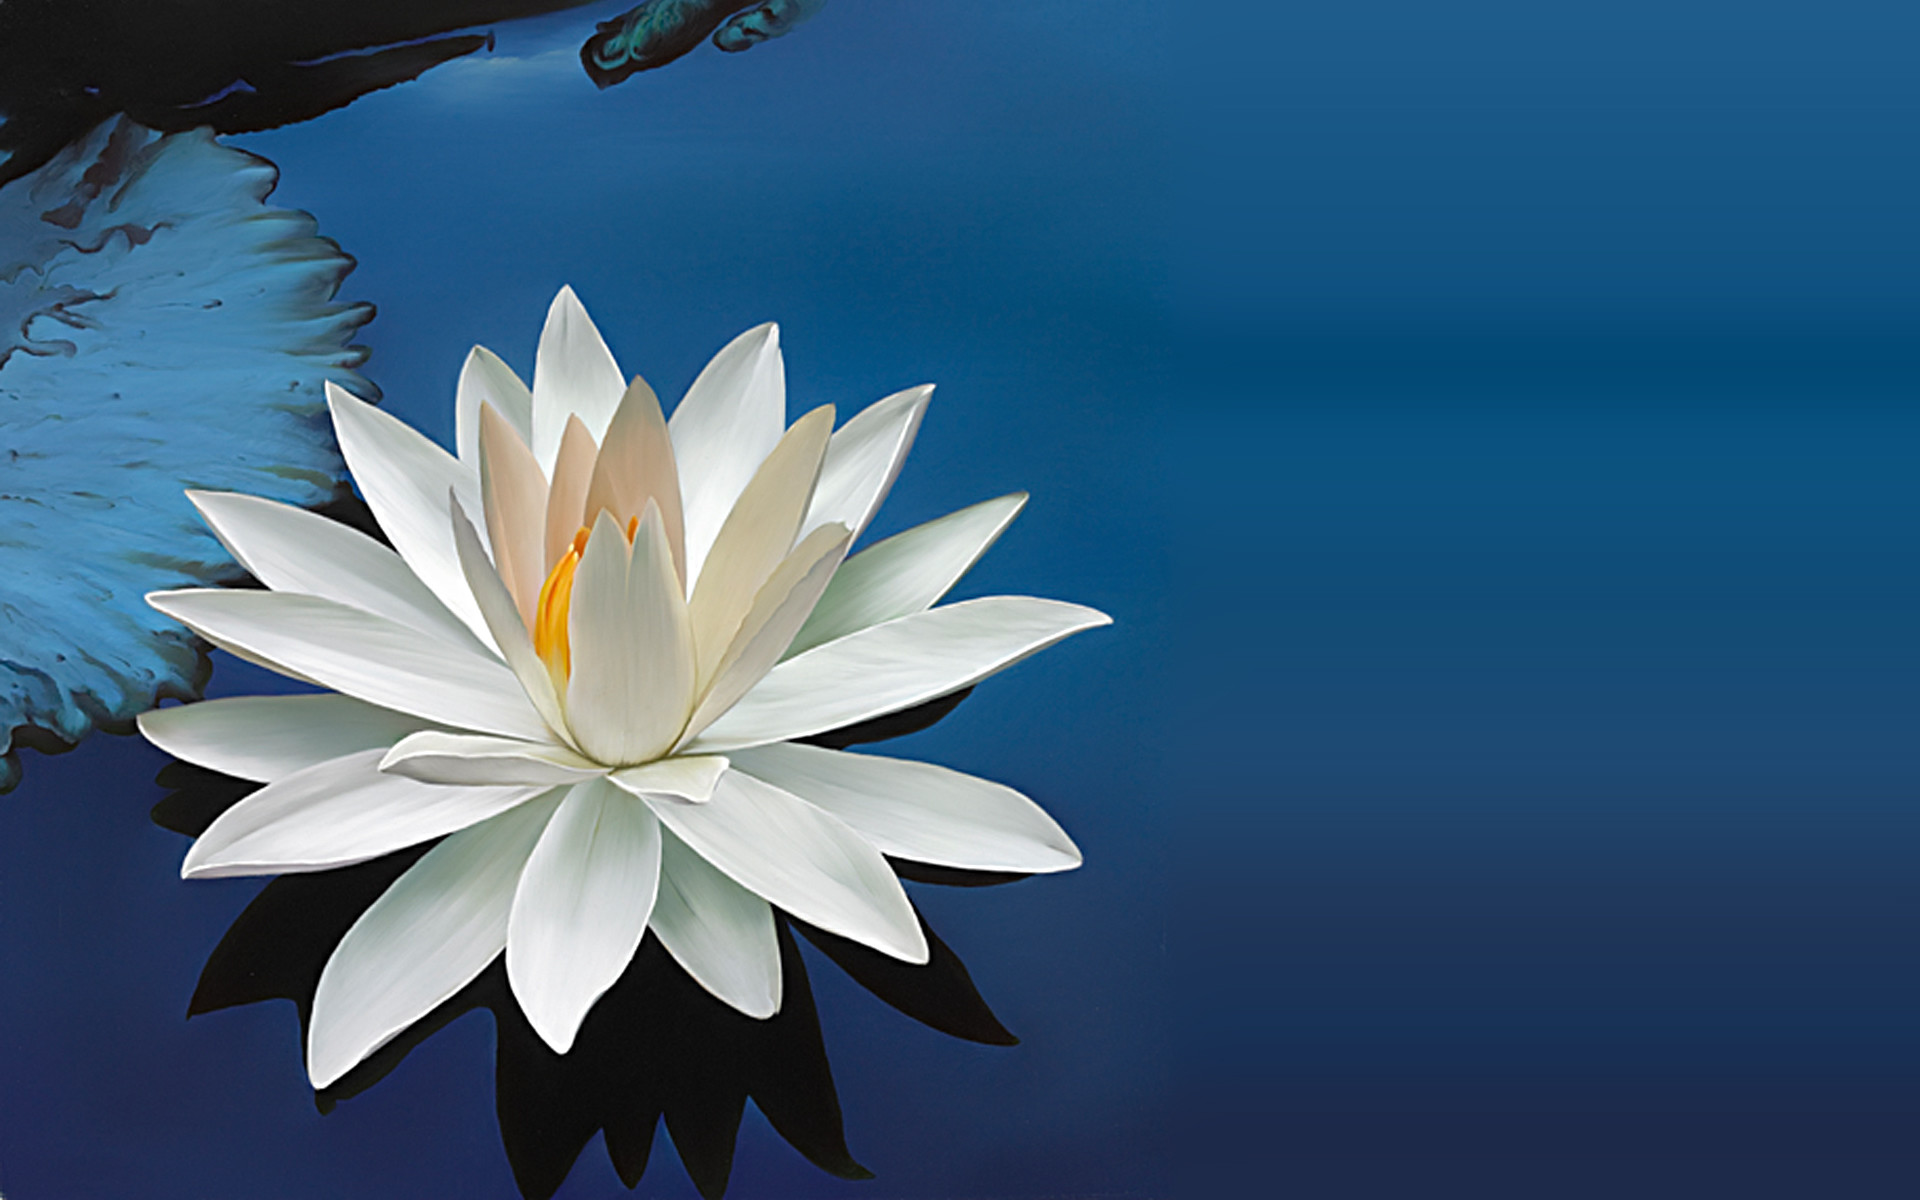 Lotus Flower Wallpaper ① Wallpapertag